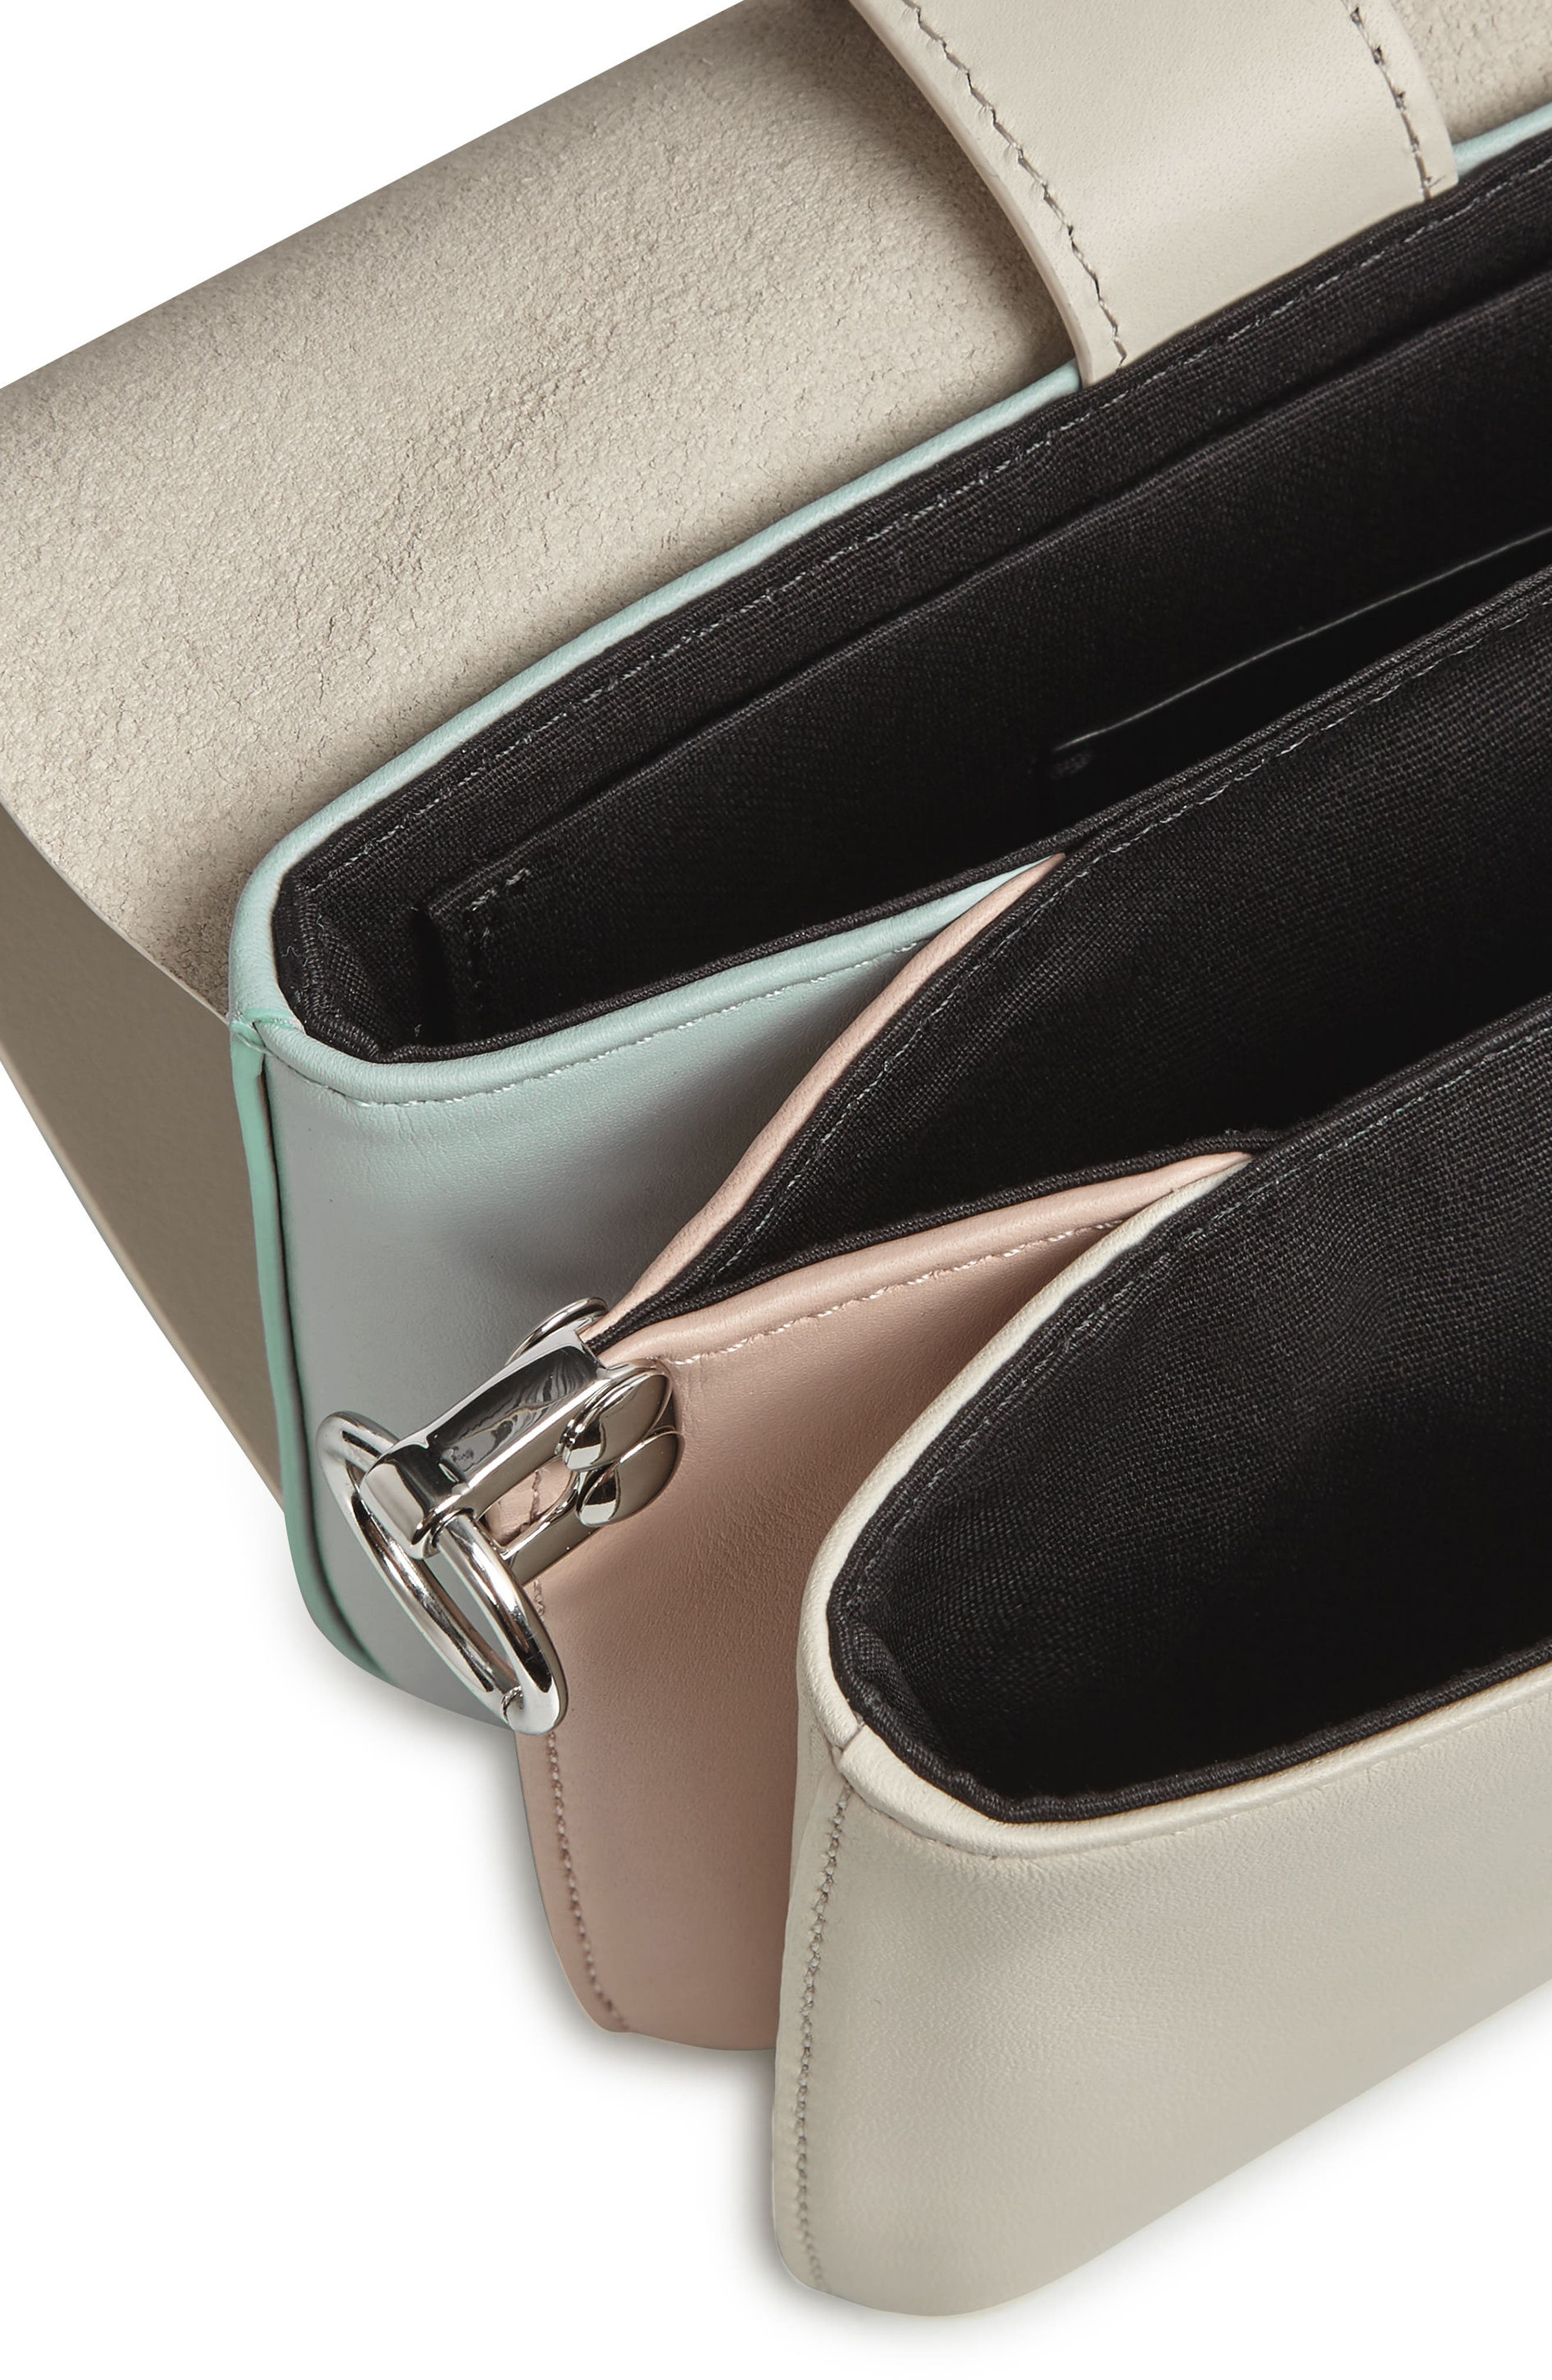 Zep Colorblock Leather Shoulder Bag,                             Alternate thumbnail 3, color,                             115